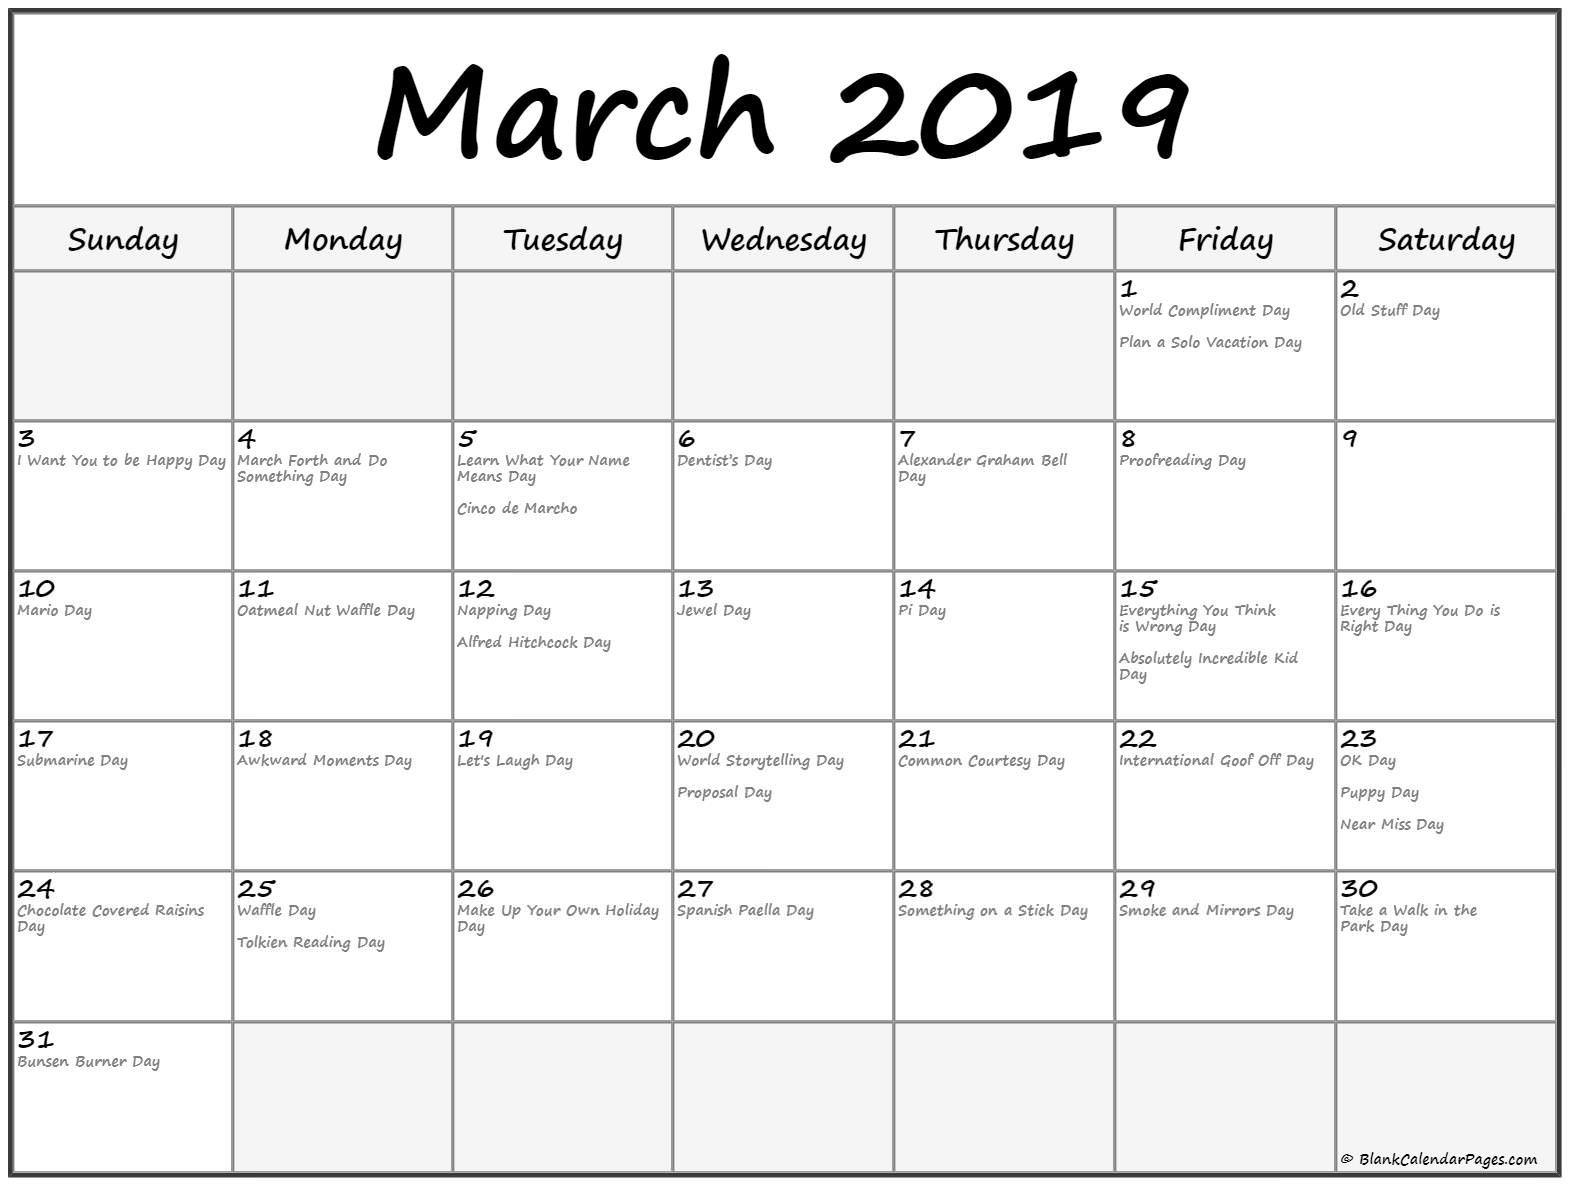 March 2019 Calendar Philippines